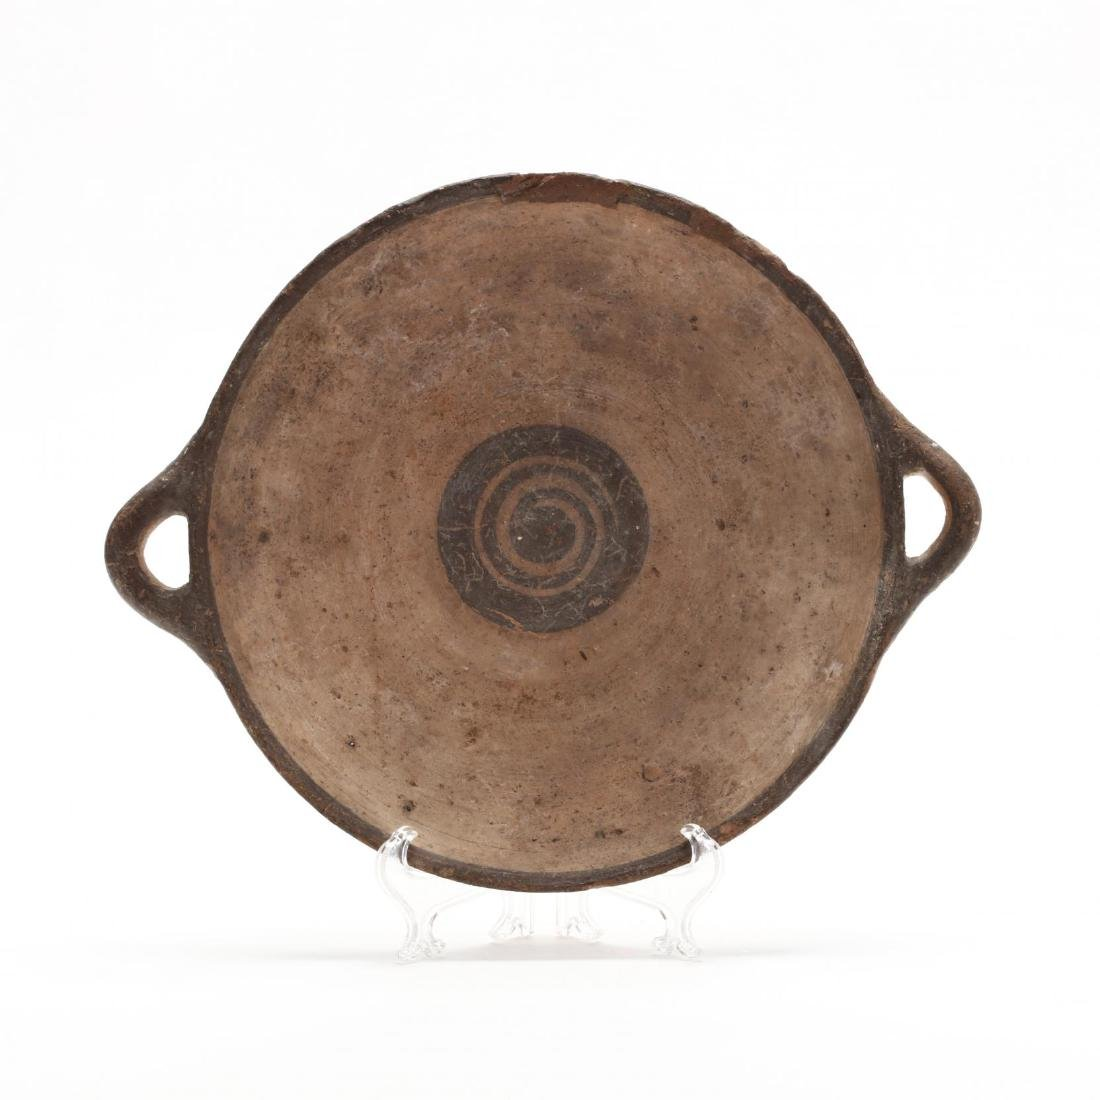 Cypro-Geometric Bichrome Ware Dish